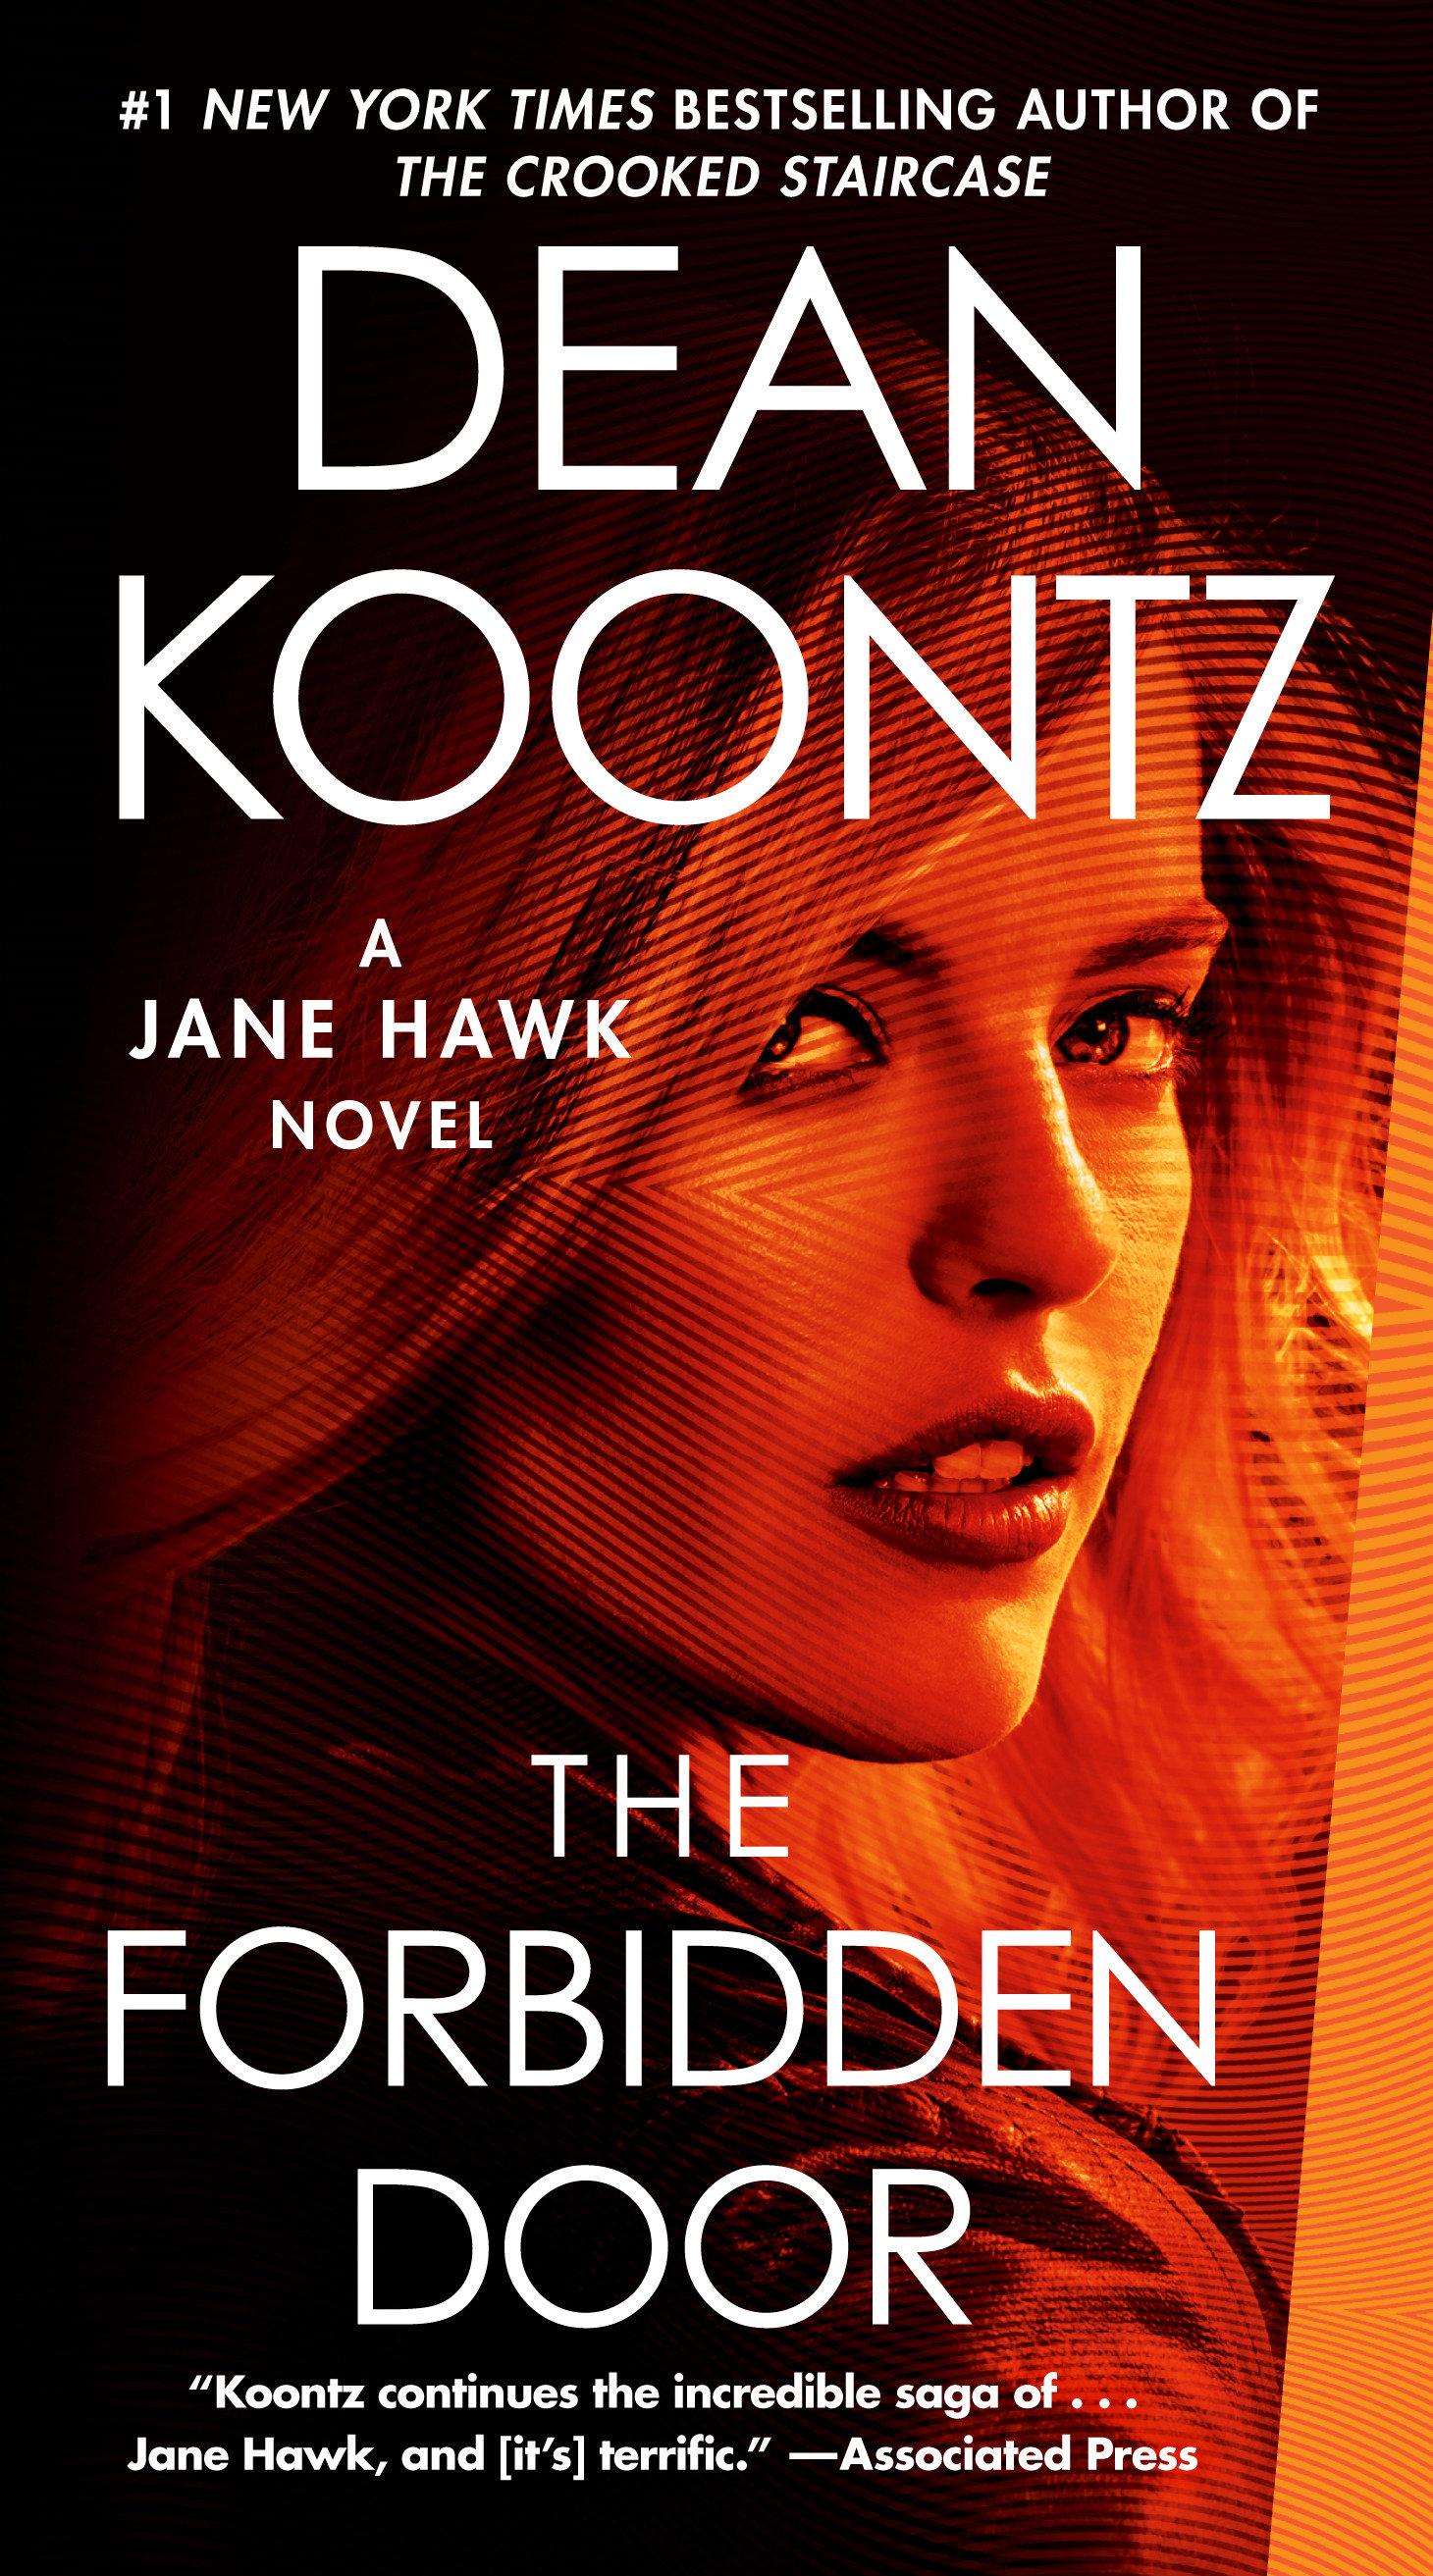 The Forbidden Door A Jane Hawk Novel